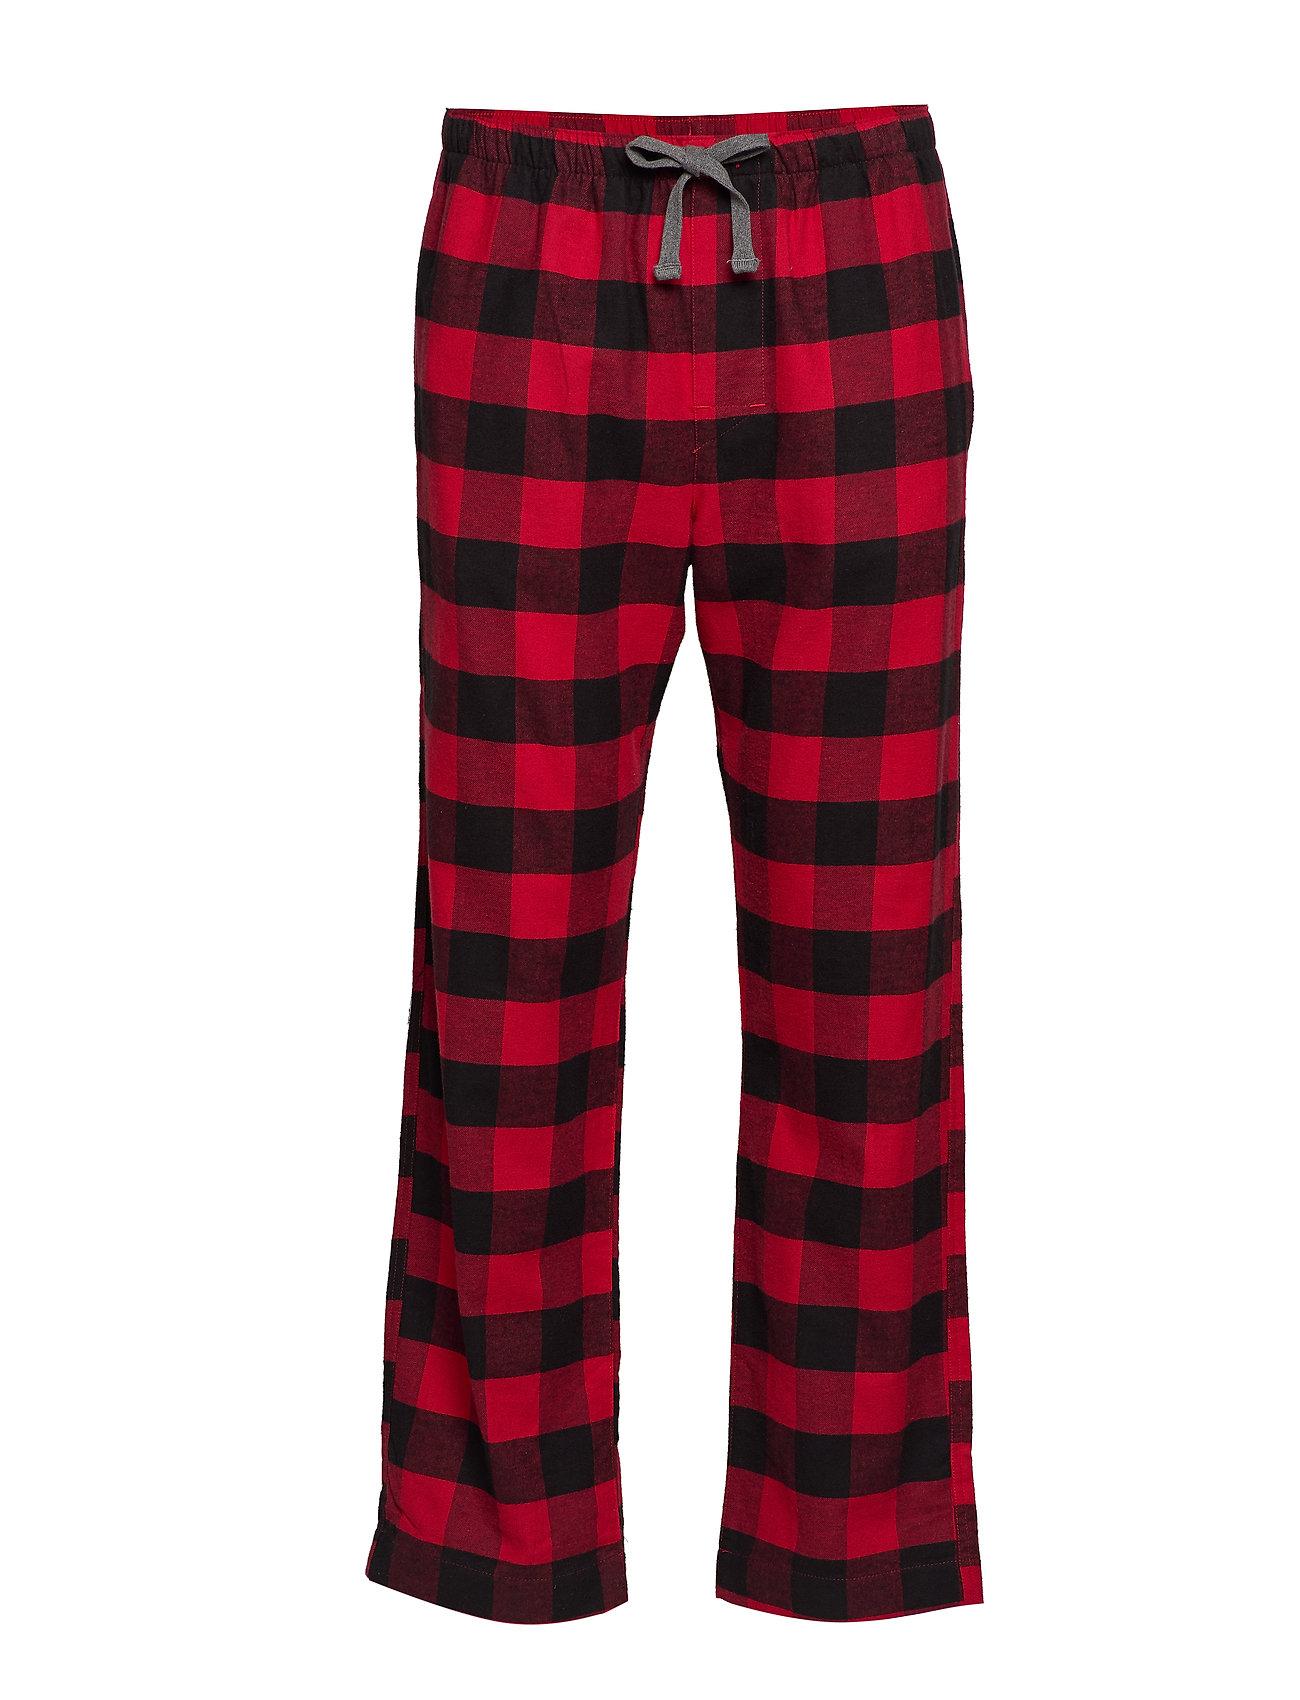 Image of Flannel Pajama Pants Hyggebukser Rød GAP (3262246095)